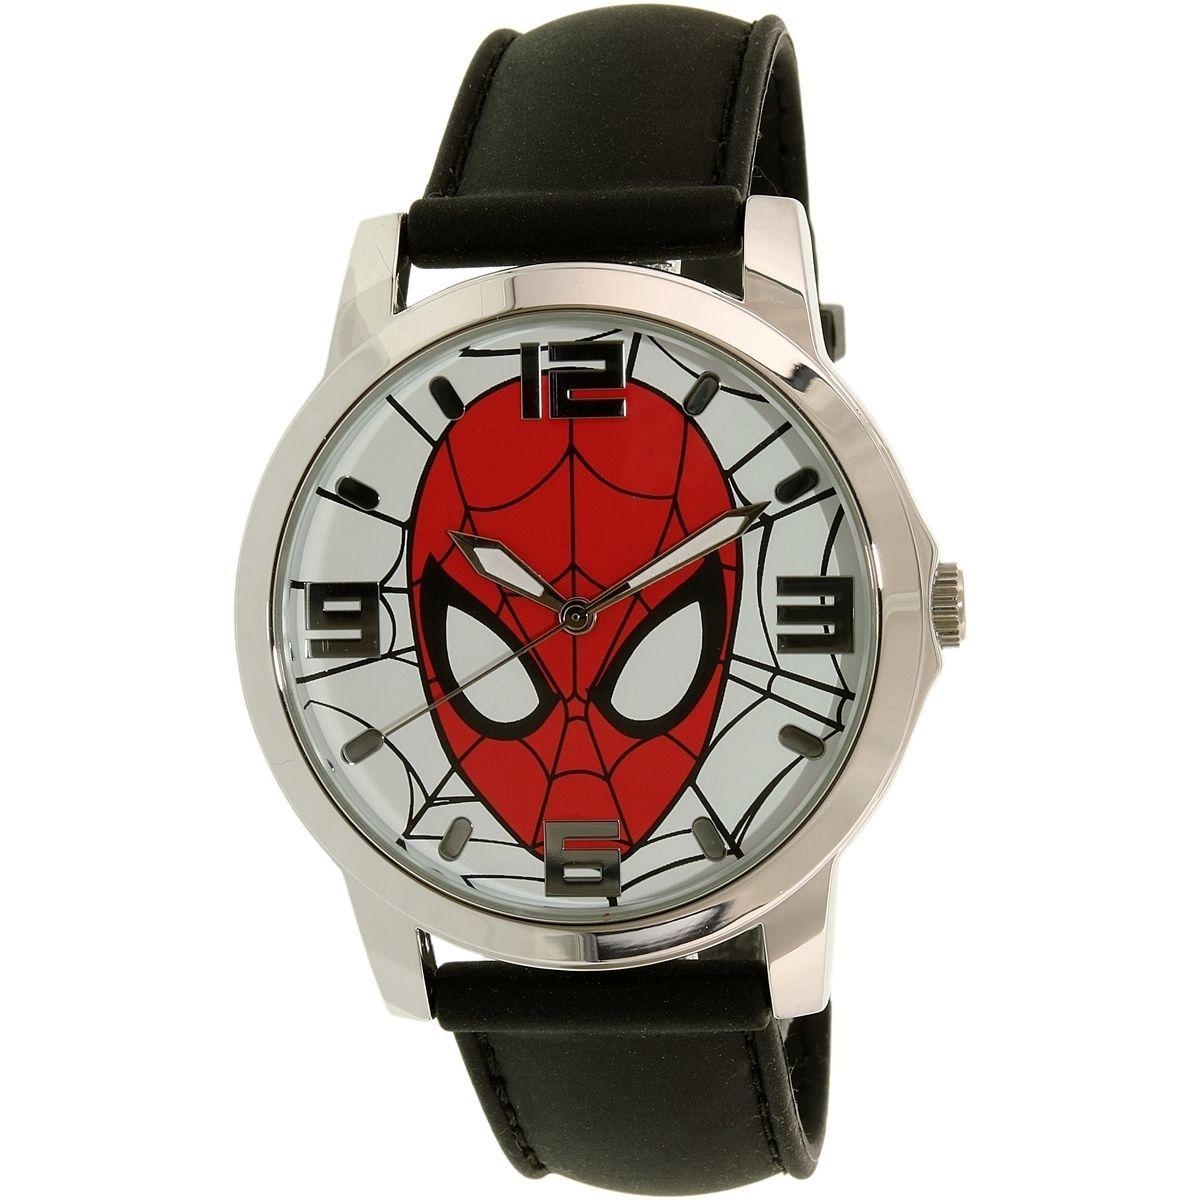 Disney Ultimate Spider-Man SPMAQ579 Black /Stainless Steel Analog Quartz Men's Watch